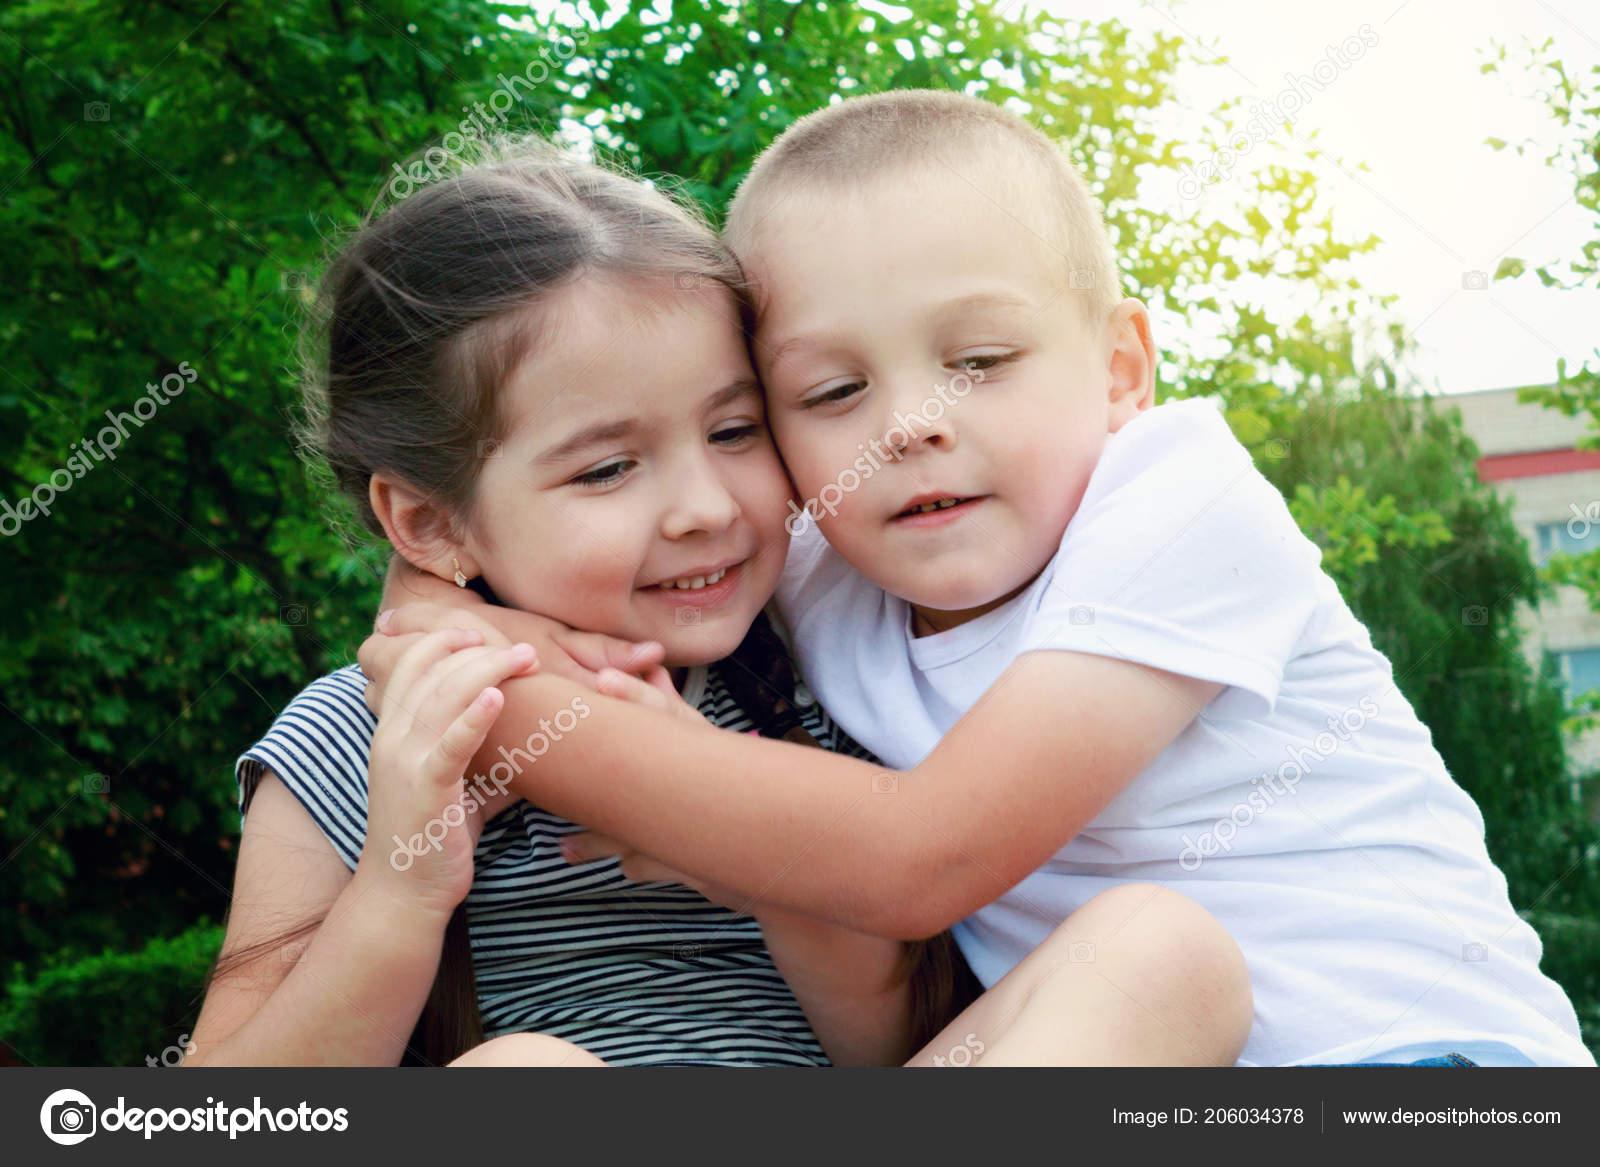 fa5172b5c2f Χαρούμενα Παιδιά Αγόρι Και Κορίτσι Συνεδρίαση Για Γρασίδι Έχει ...